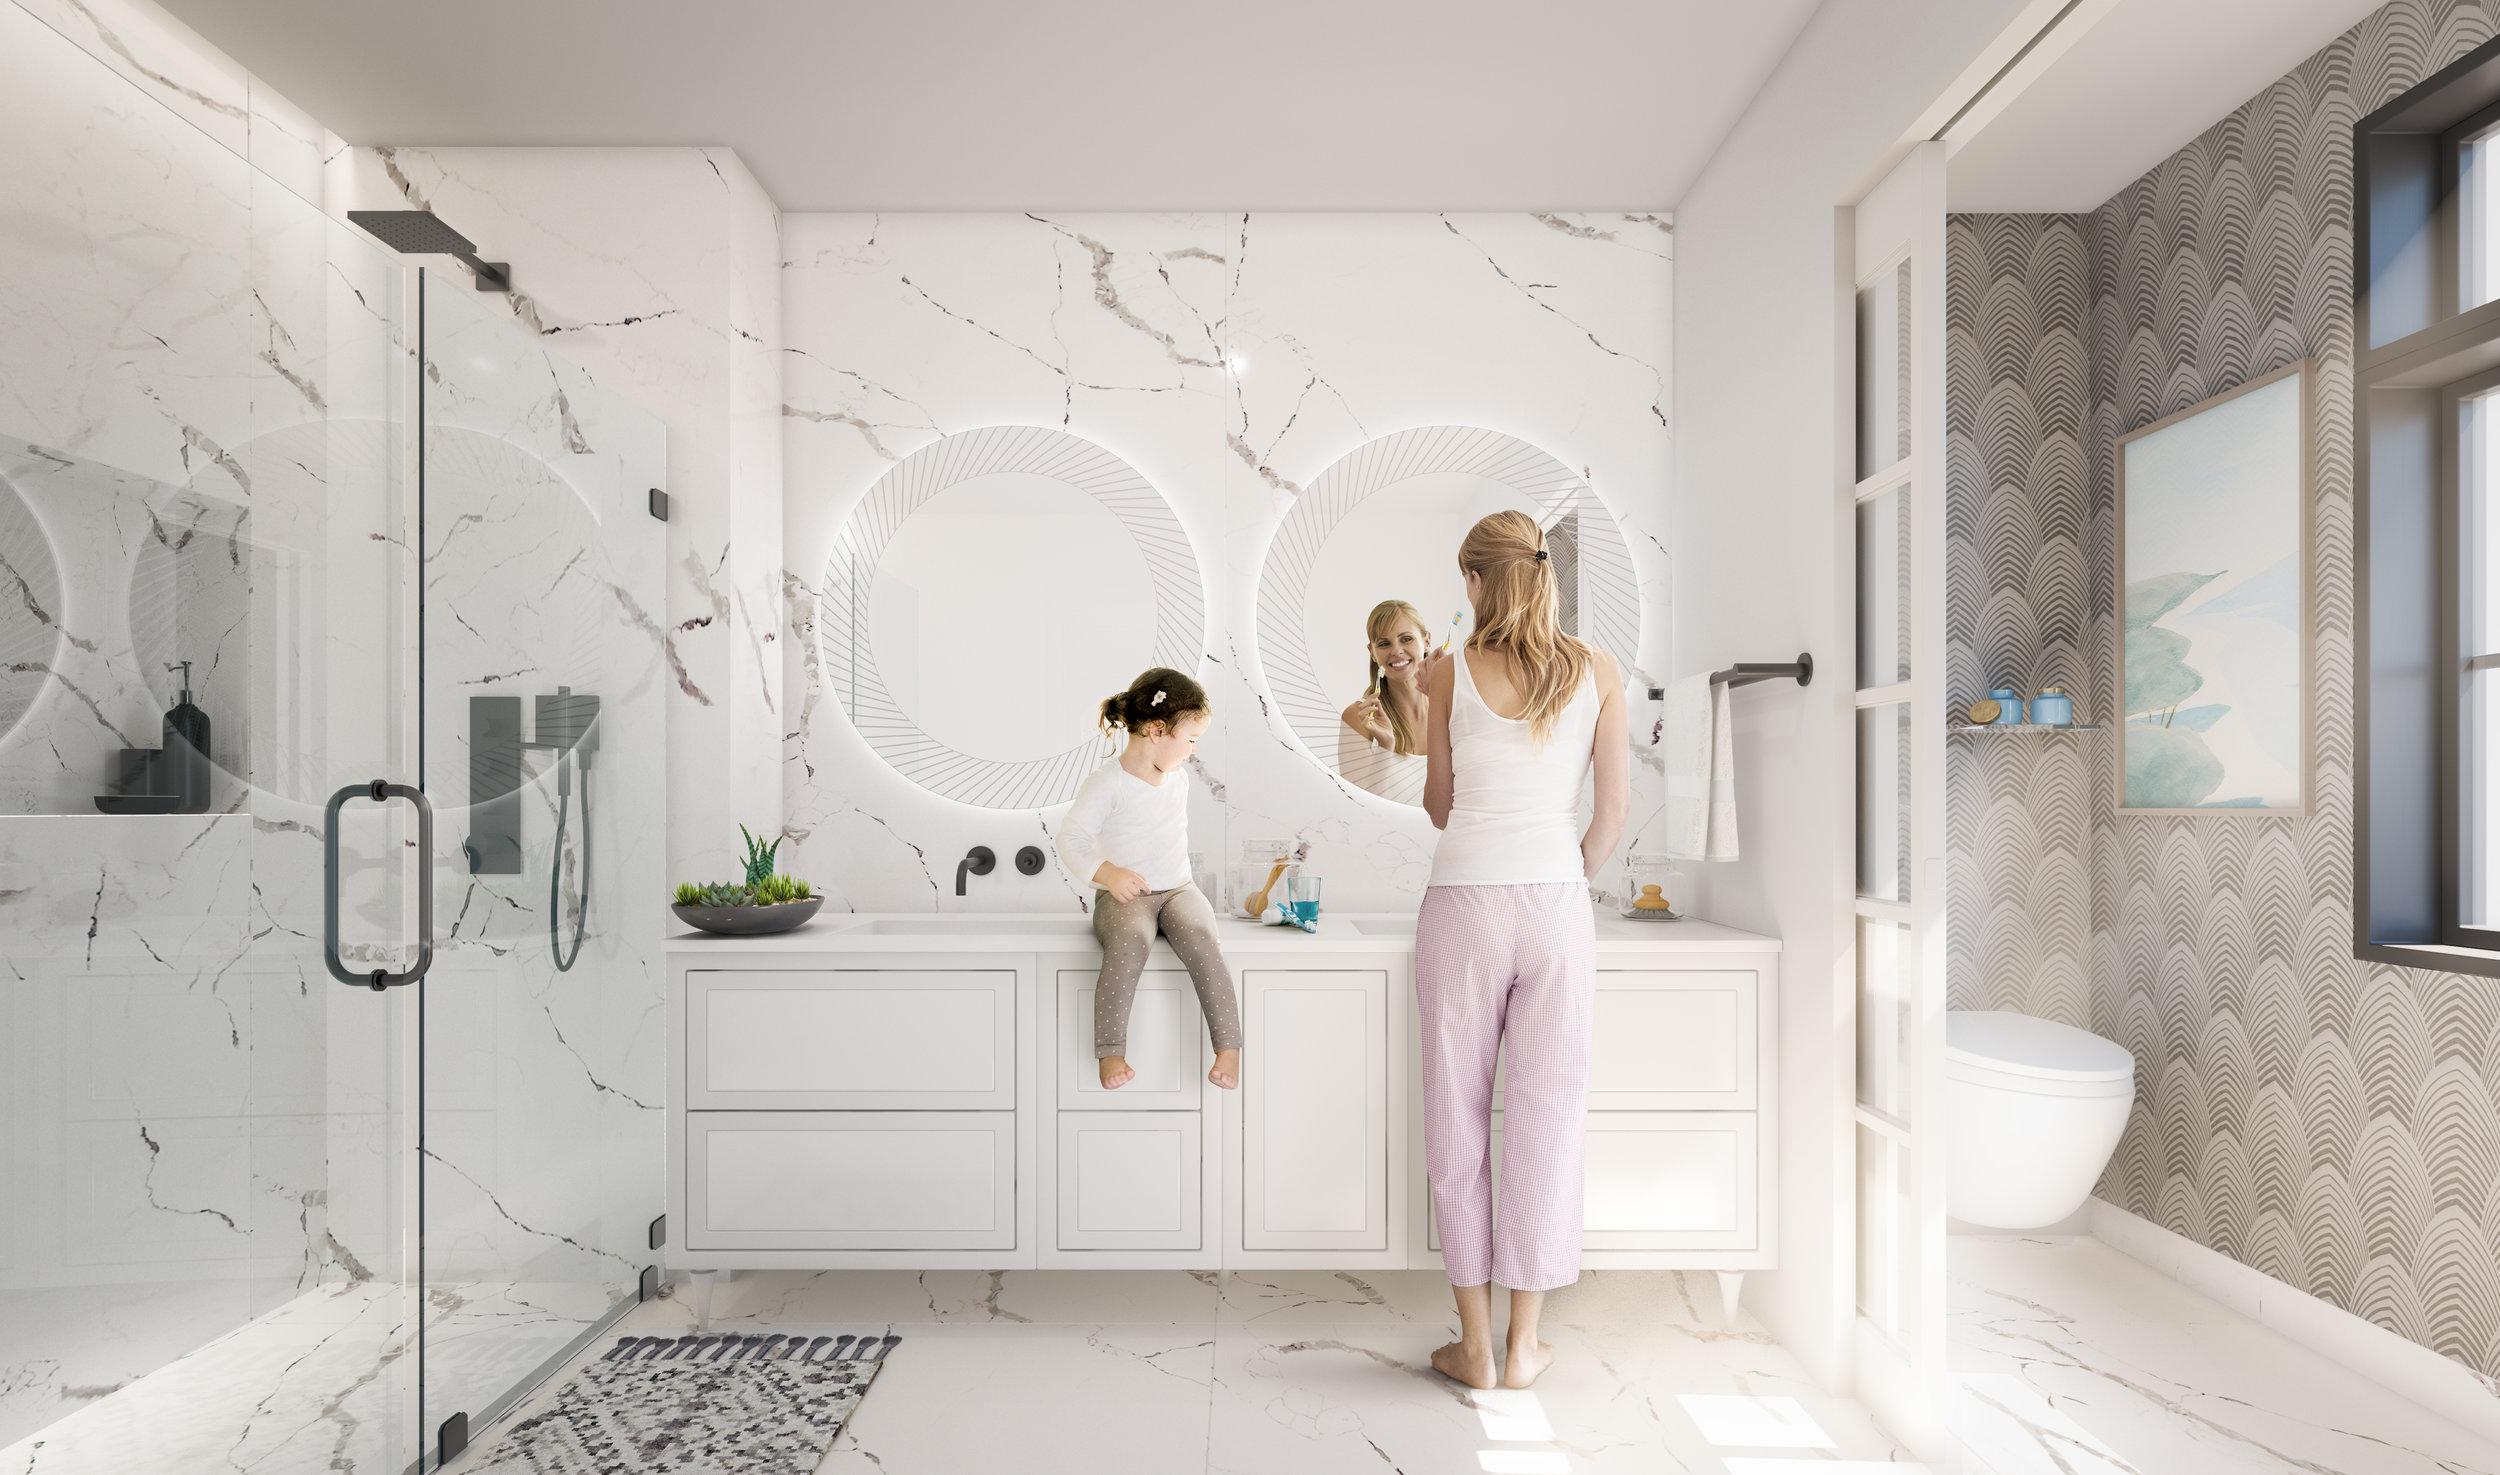 NORM-LI_180625_INT_Bathroom.jpg